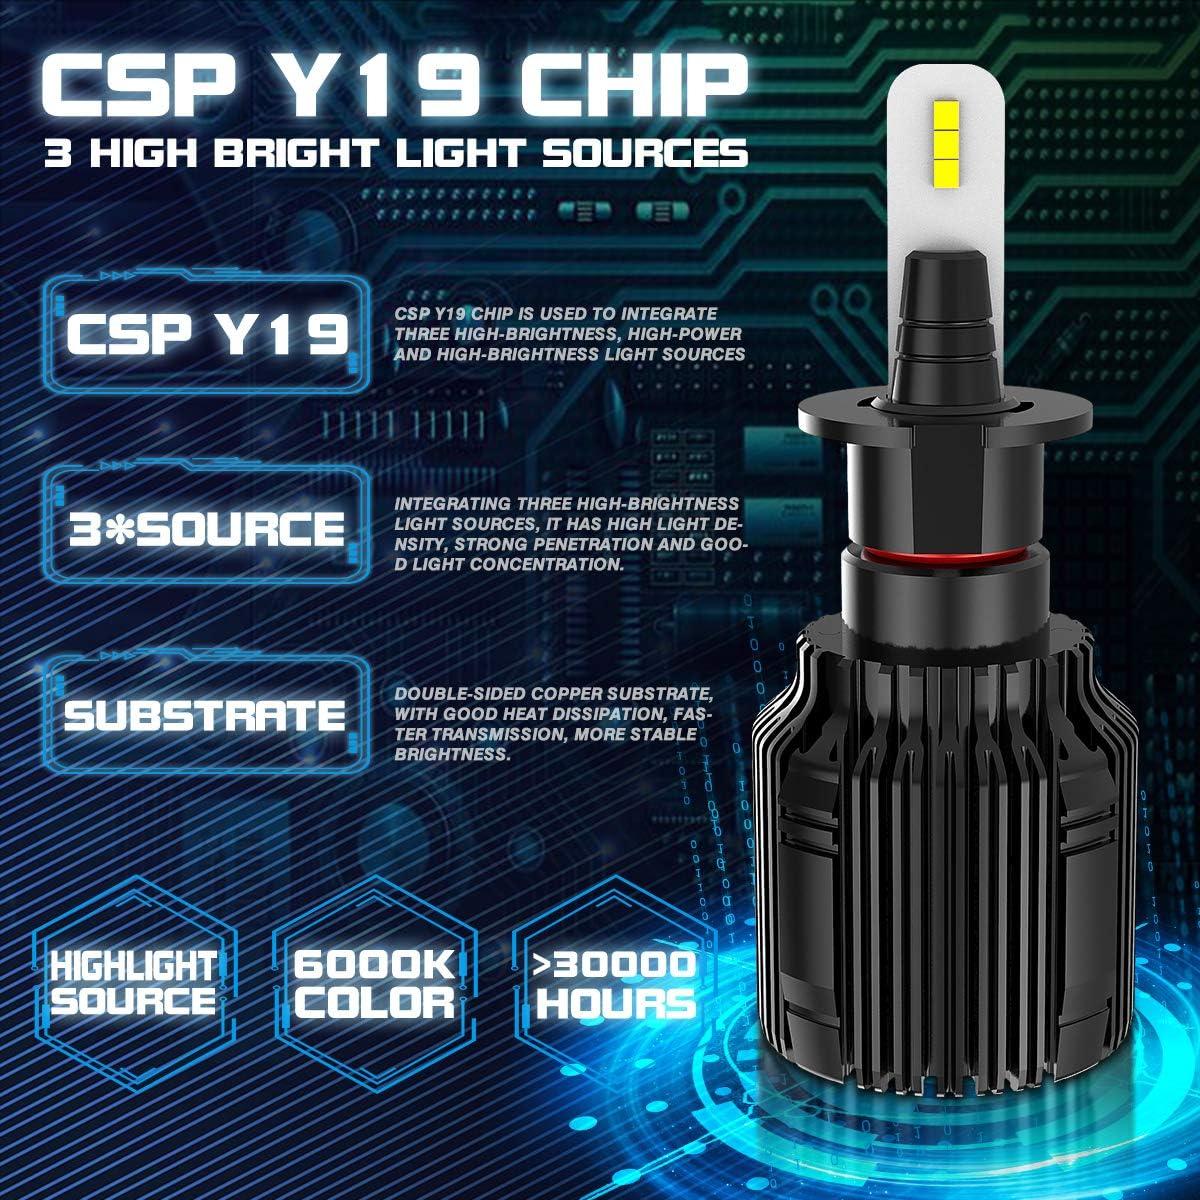 Pack of 2 TUINCYN H3 LED Headlight Bulb Fanless 6500K Xenon White 8000 Lumens CSP Chip All-in-one Head Light Headlamp Conversion Kit Bright Fog Light DRL Driving Lamp